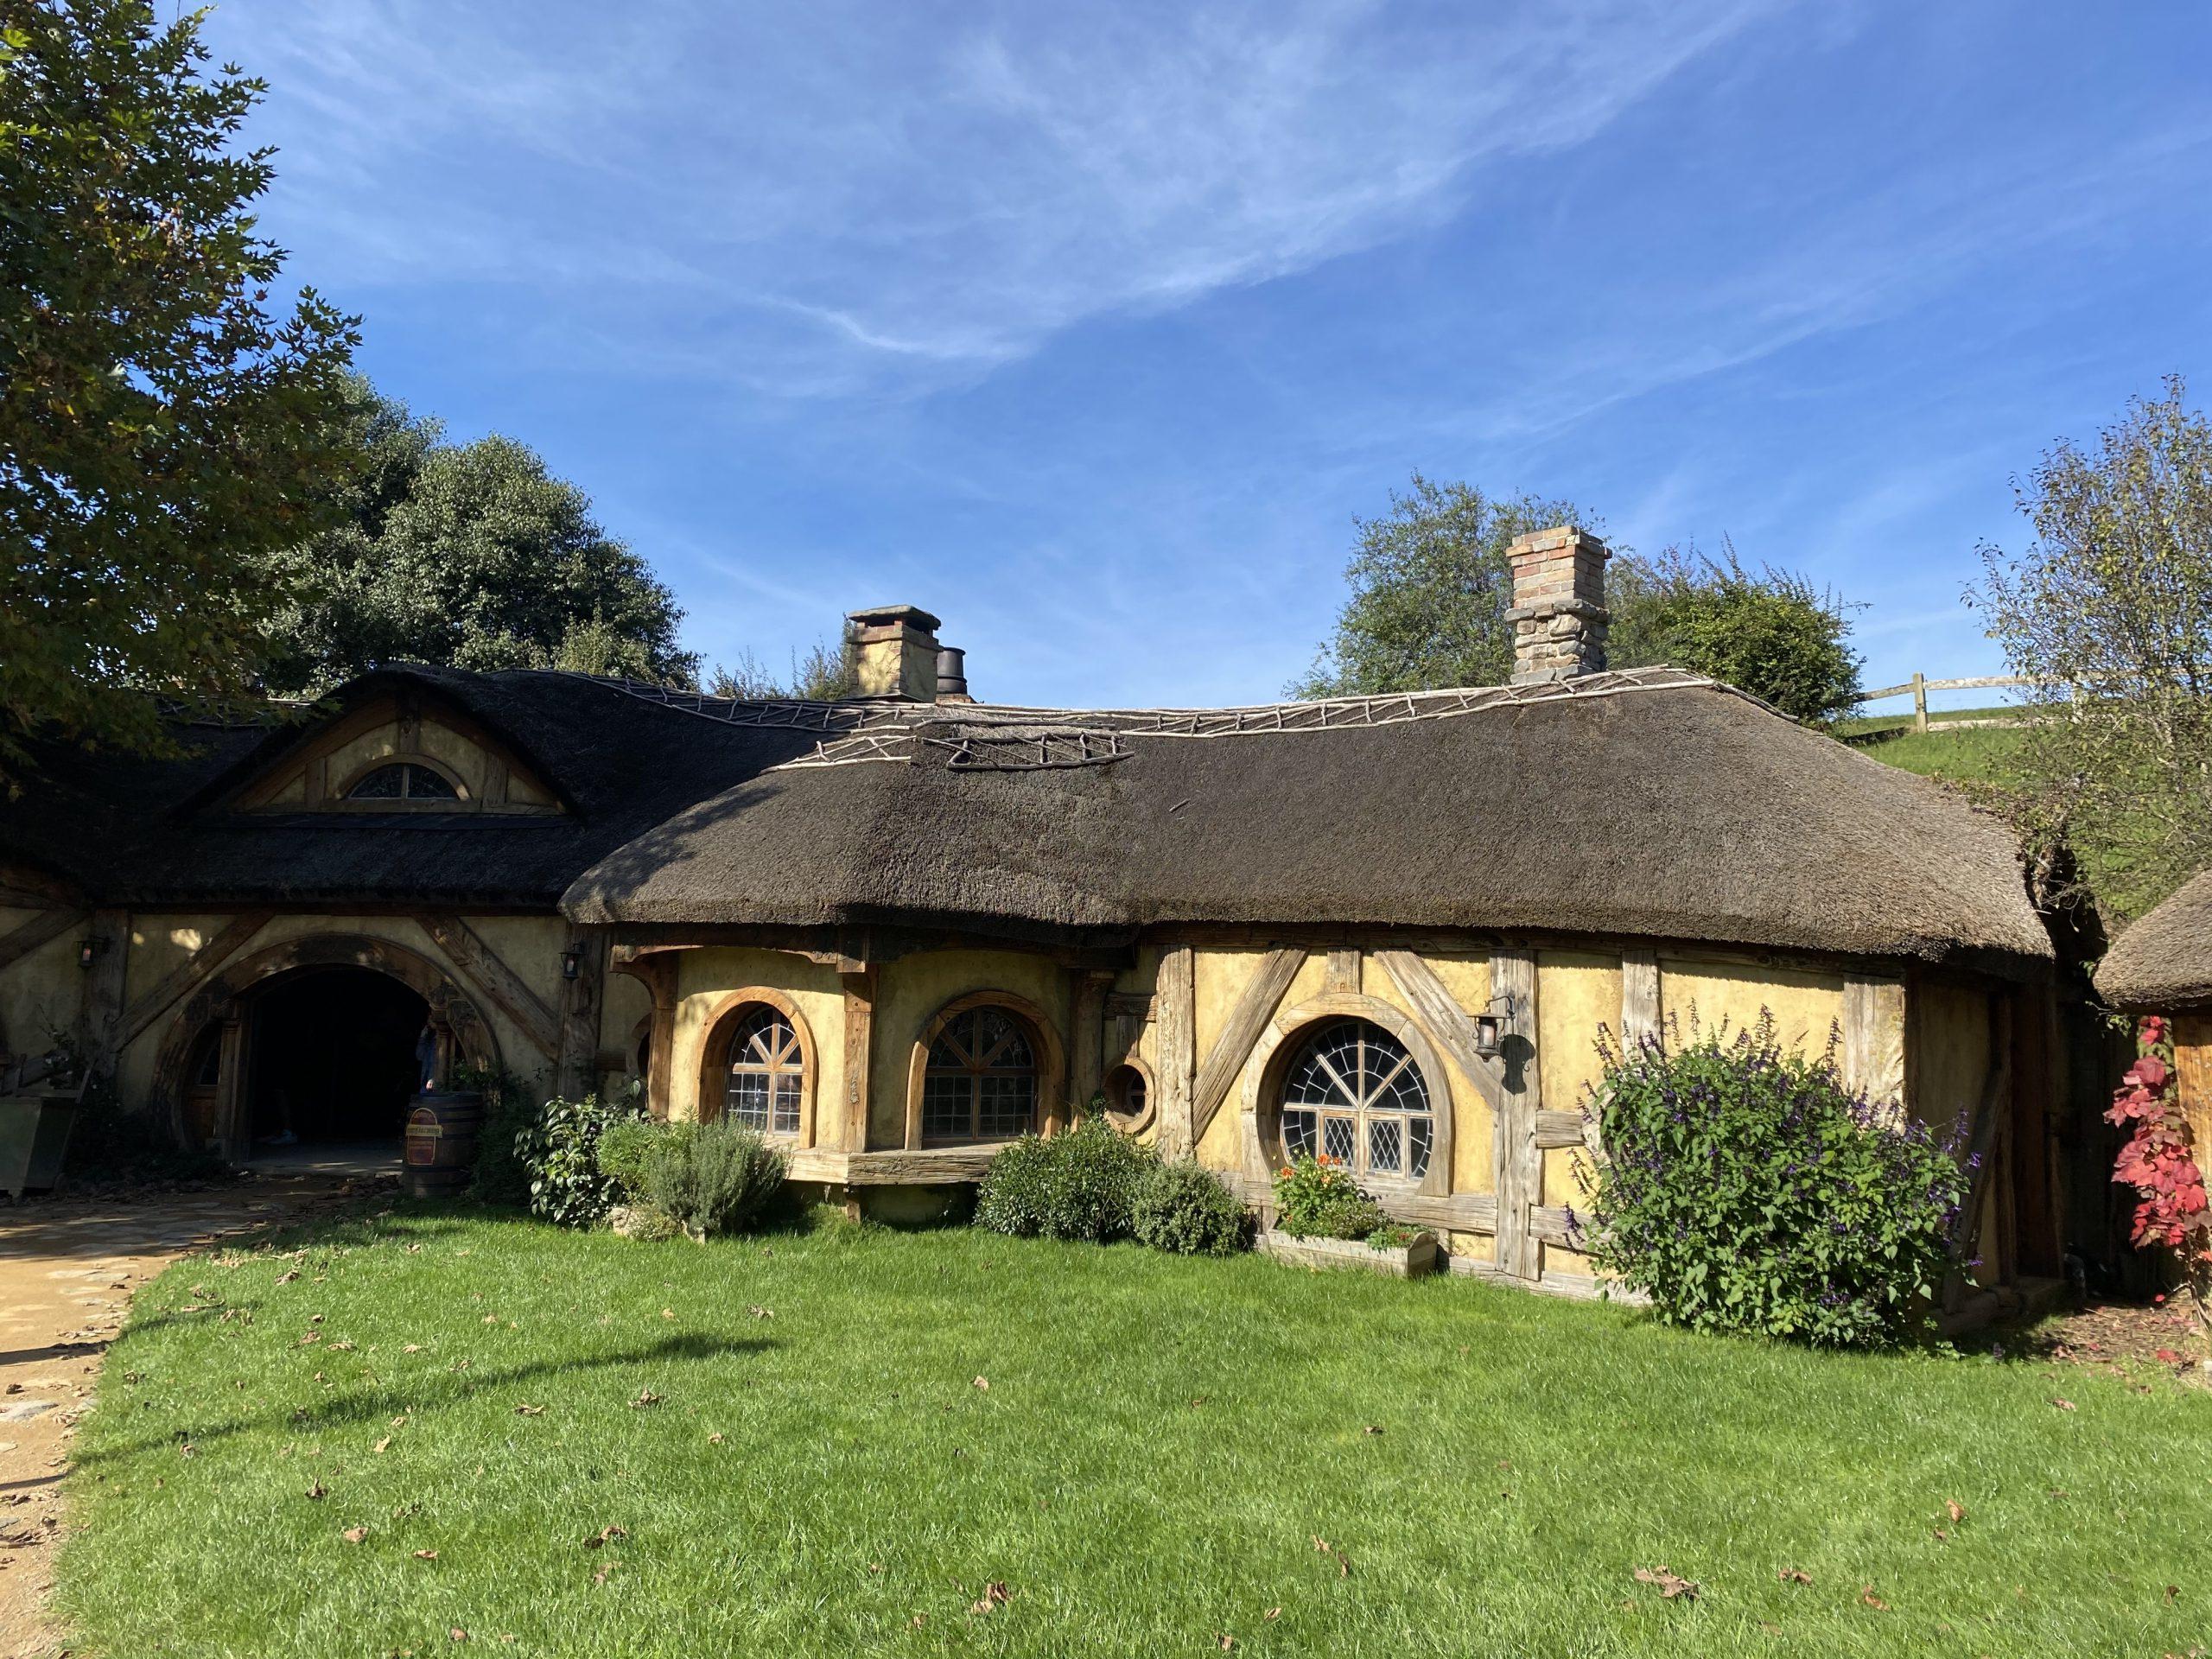 The Green Dragon Inn at Hobbiton Movie Set, New Zealand